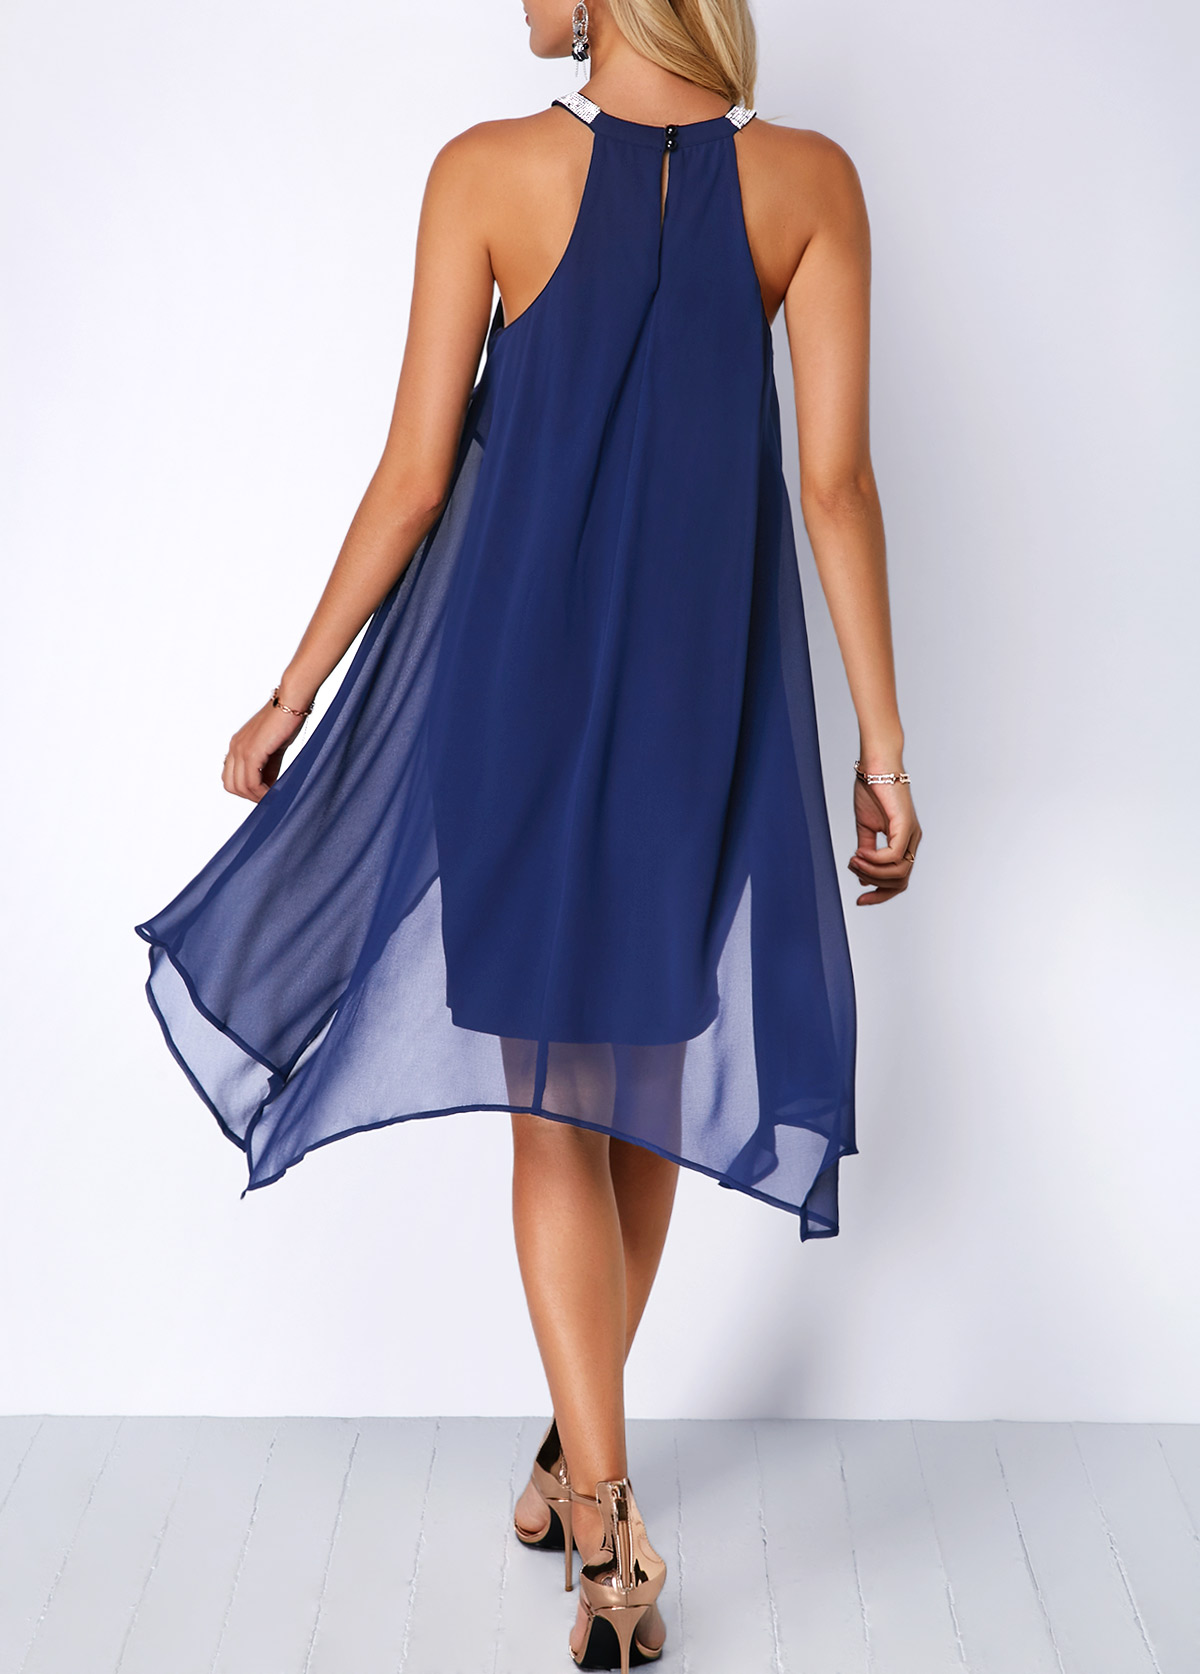 Embellished Neck Chiffon Overlay Blue Dress | Rotita.com ...